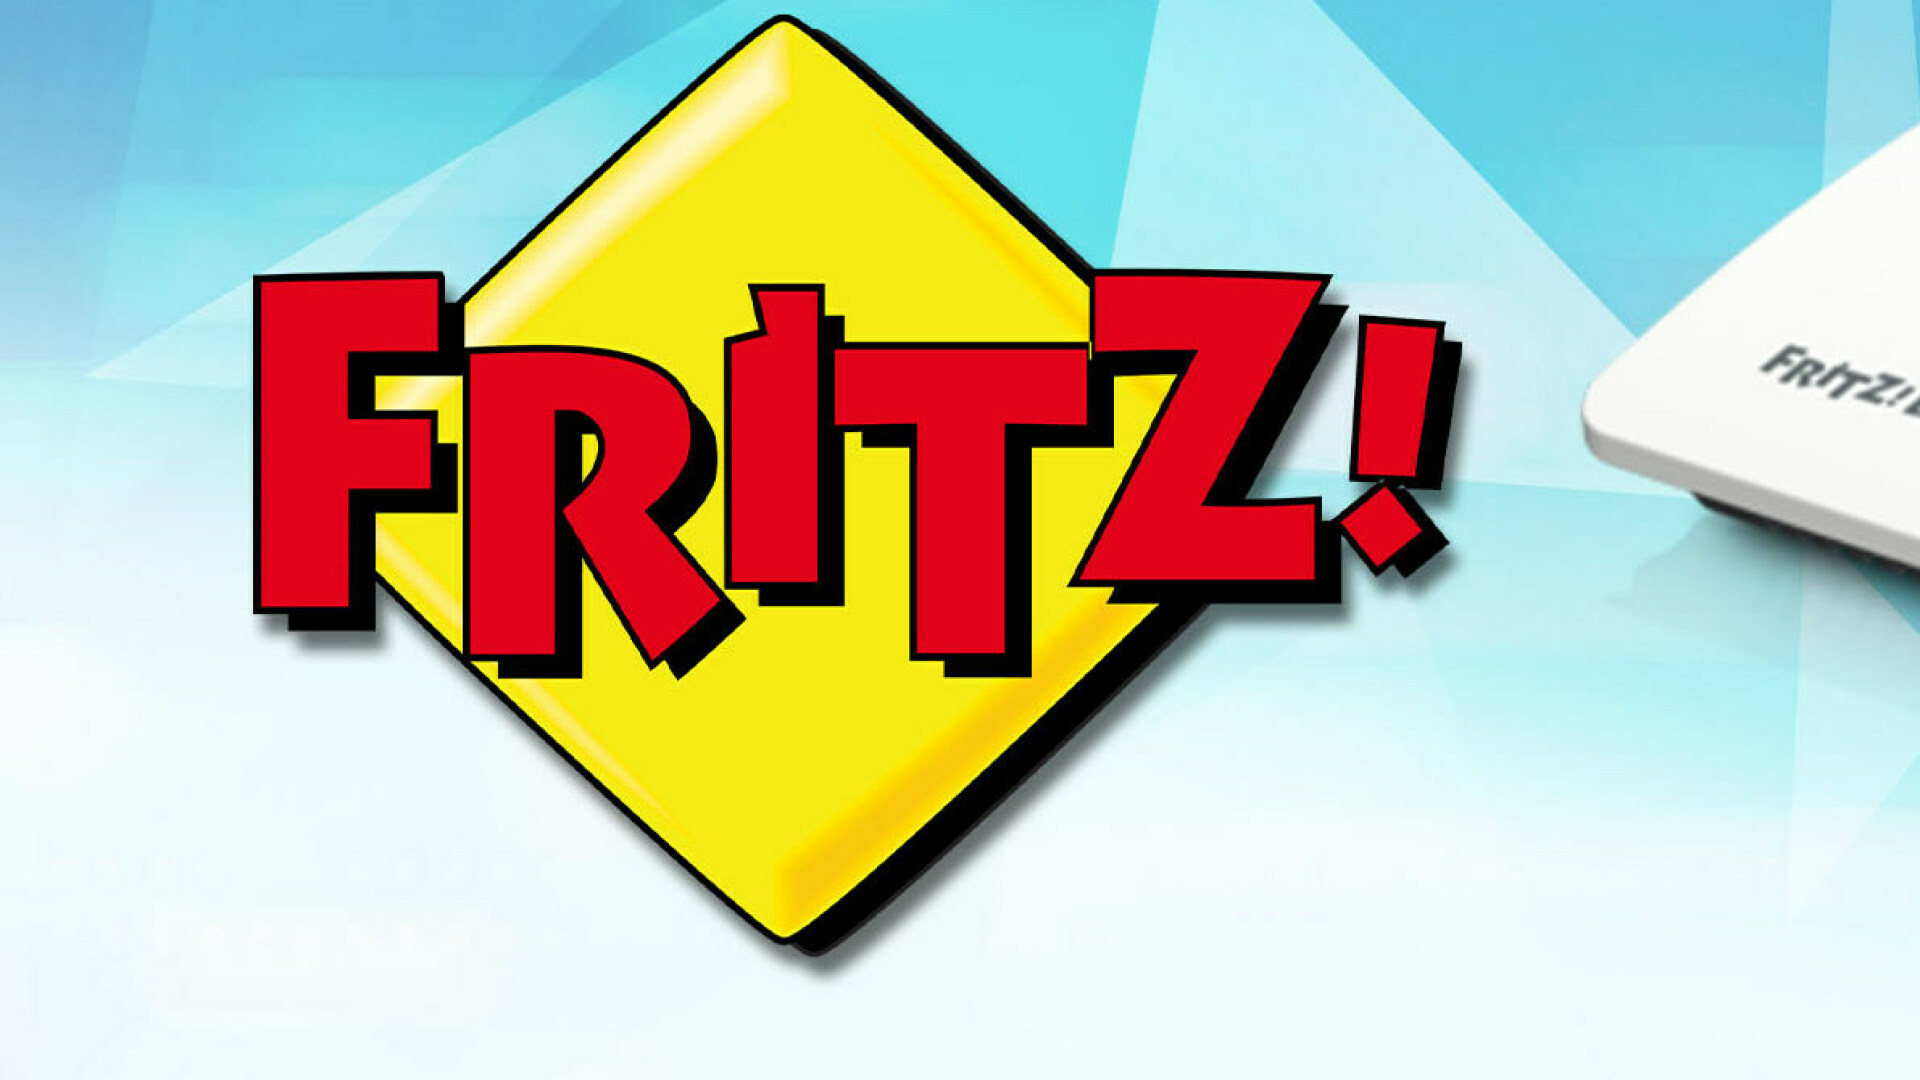 Avm, Fritzbox, FritzOS, Fritz!box, Fritz!